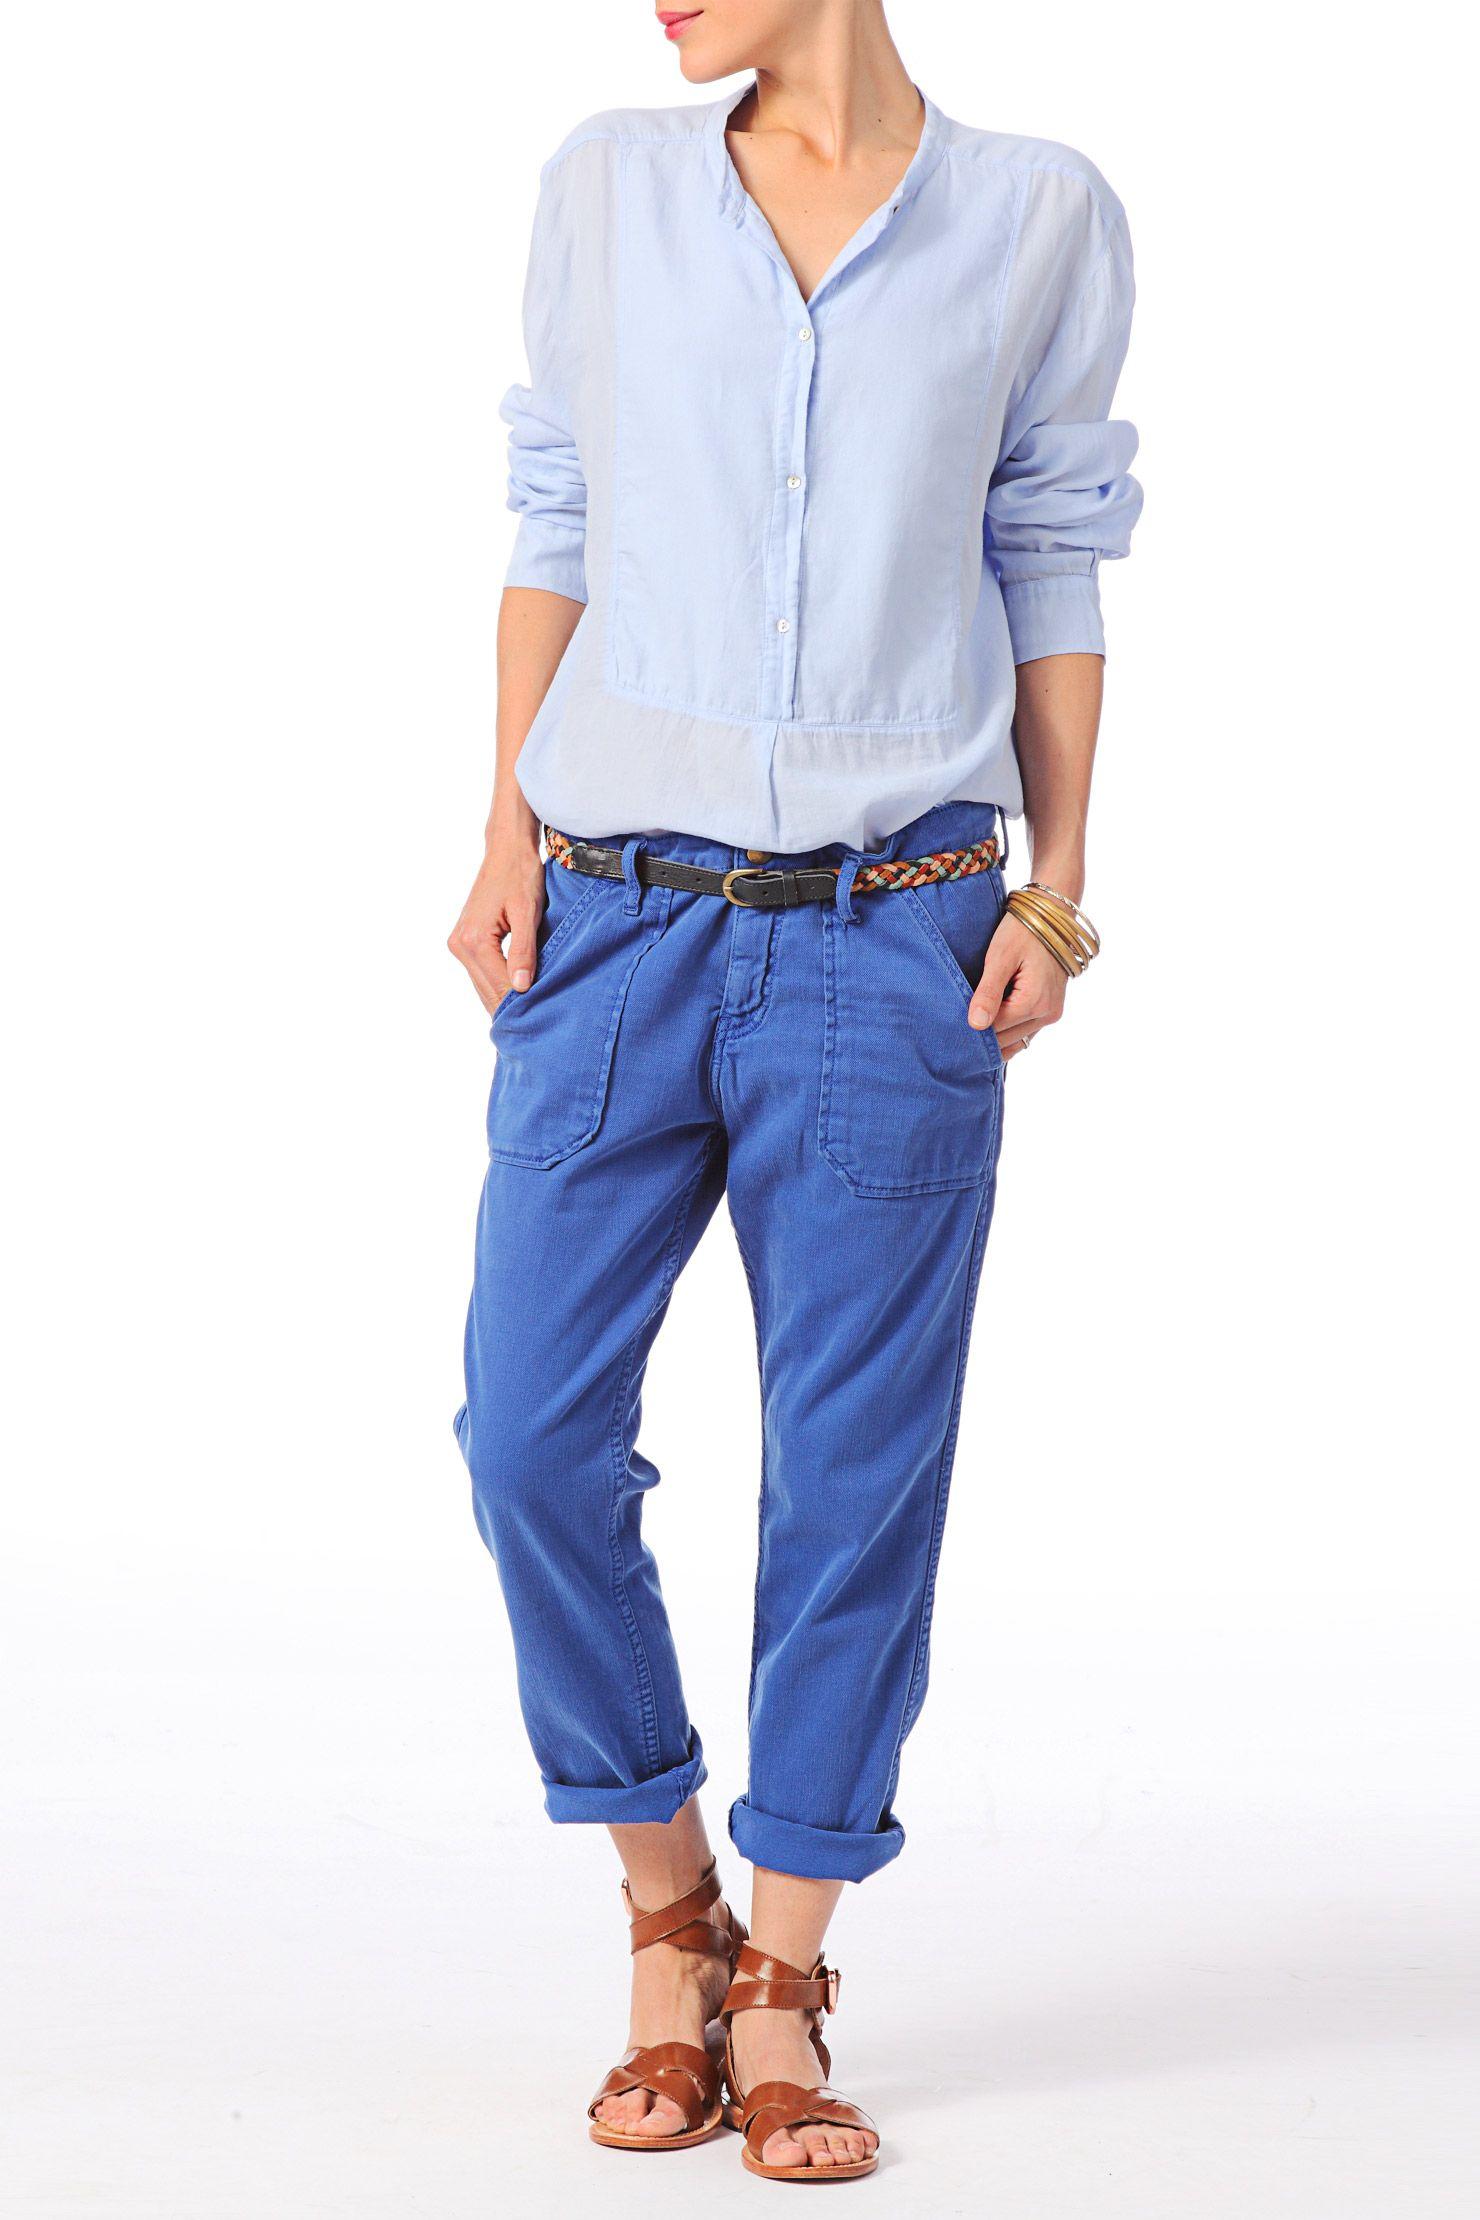 Pantalon 7/8 regular fit Sally Bleu / Marine Ba&sh sur MonShowroom.com